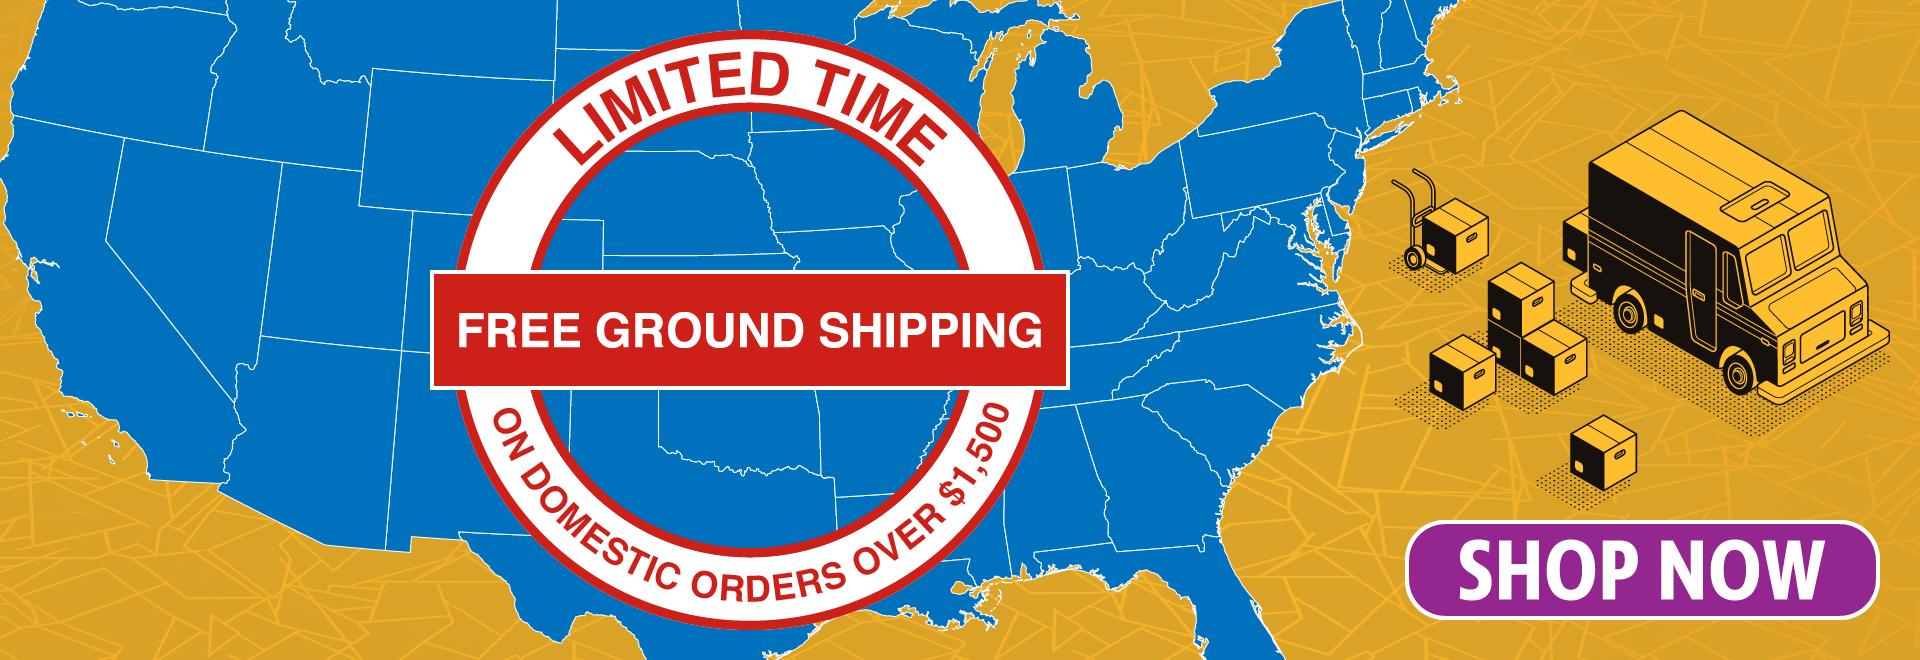 Innex Free Shipping 2021